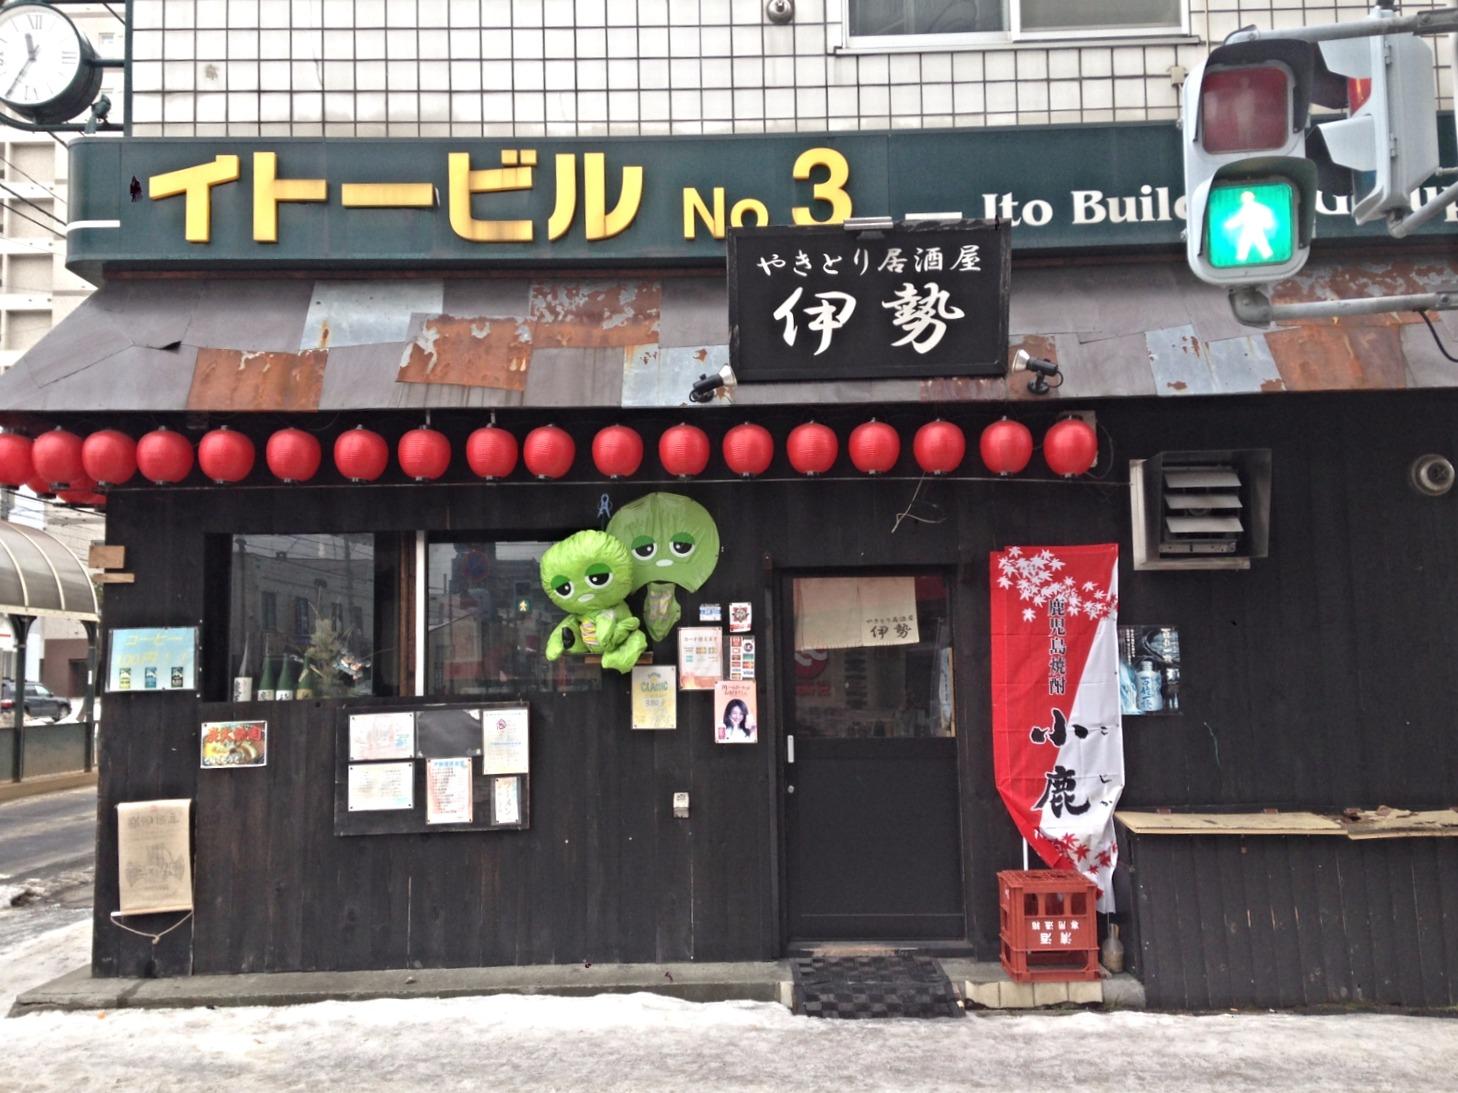 Izakaya nearby